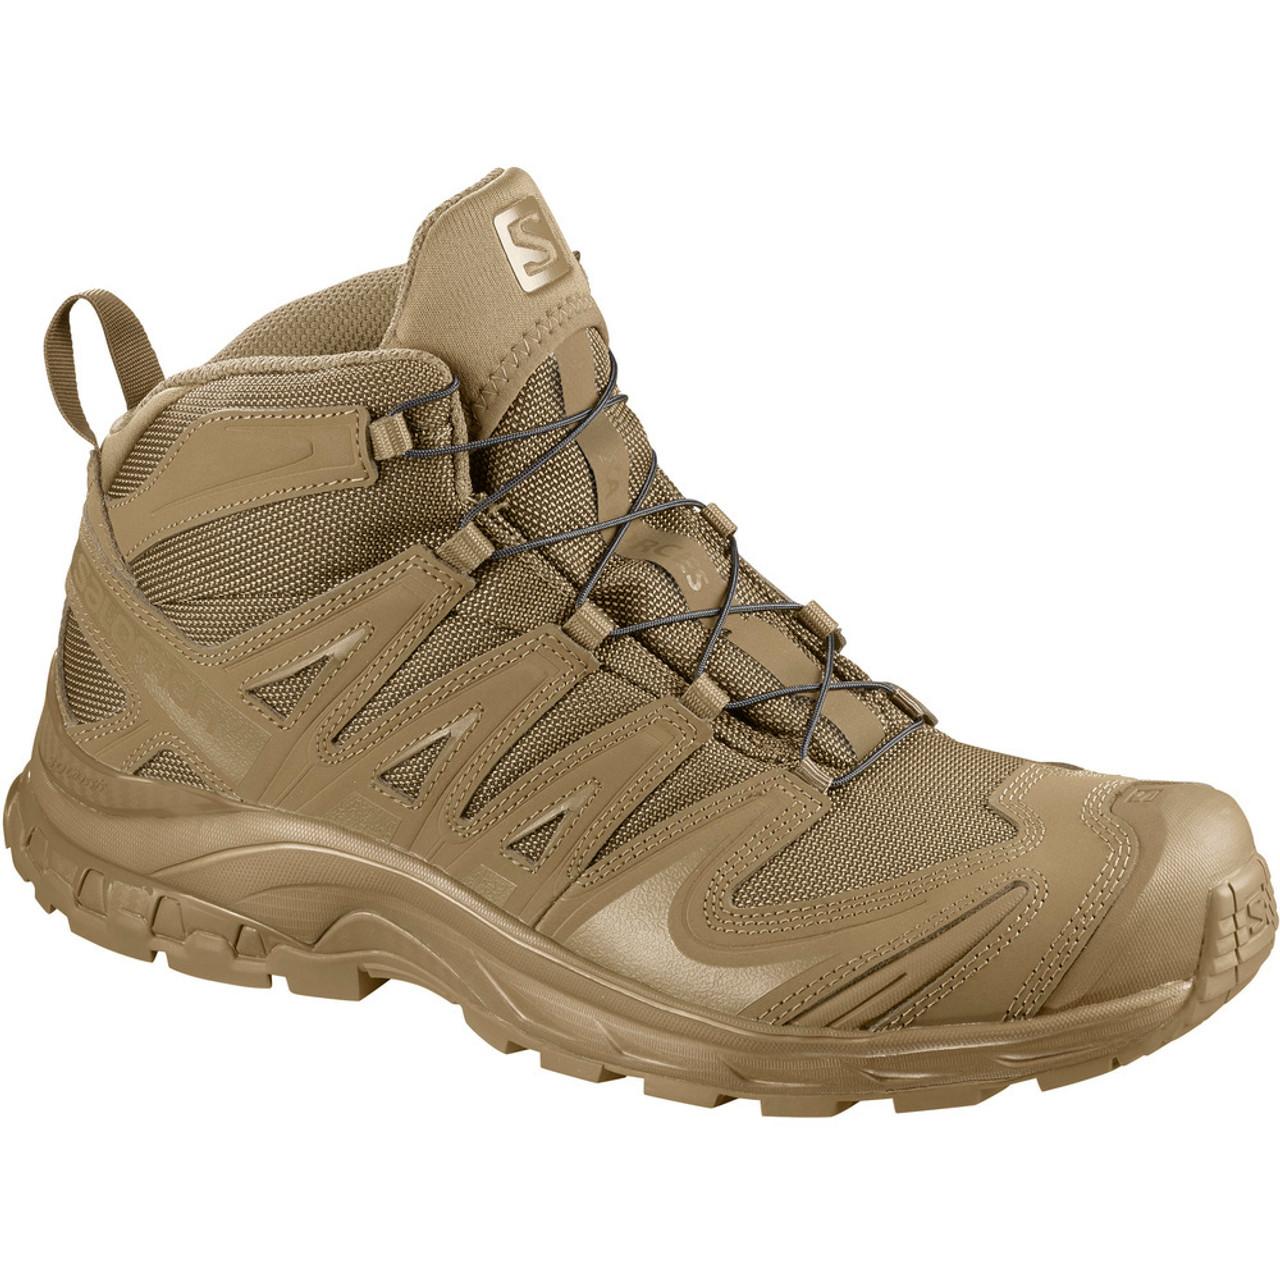 ... Salomon XA Forces Mid Tactical Boots ... fad94845bf